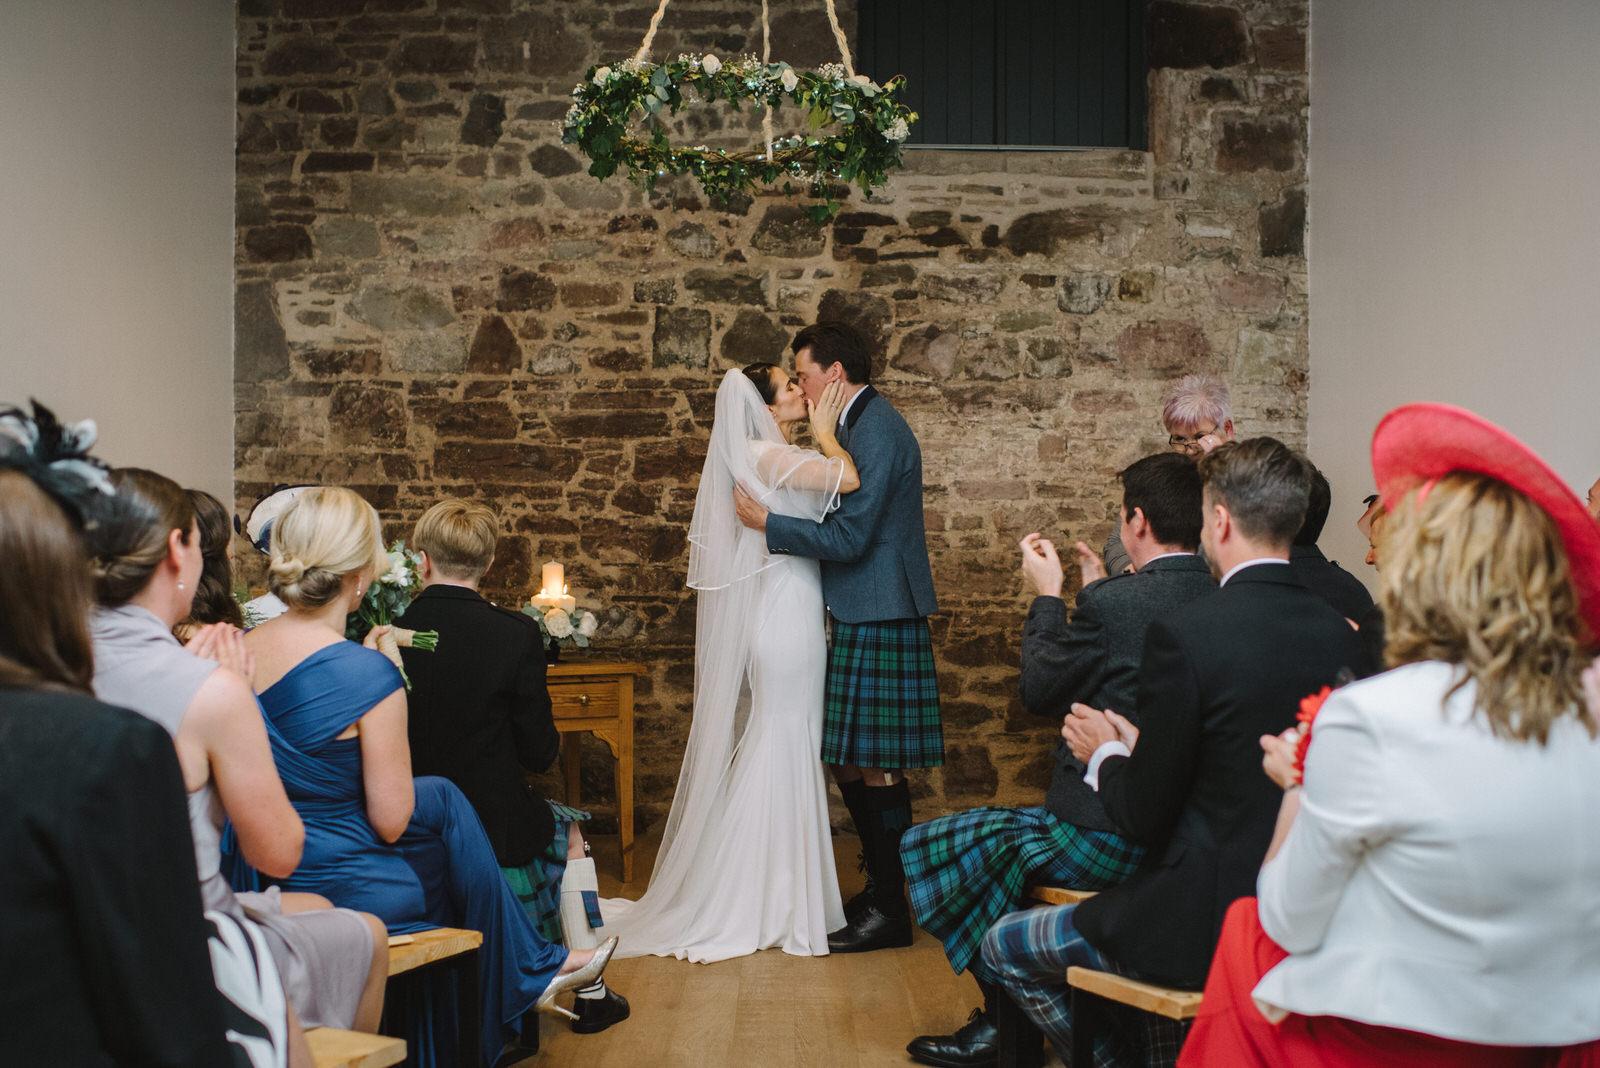 026-GUARDSWELL-FARM-WEDDING-ALTERNATIVE-SCOTTISH-WEDDING-PHOTOGRAPHER-SCOTTISH-WEDDING-DESTINATION-WEDDING-PHOTOGRAPHER.JPG